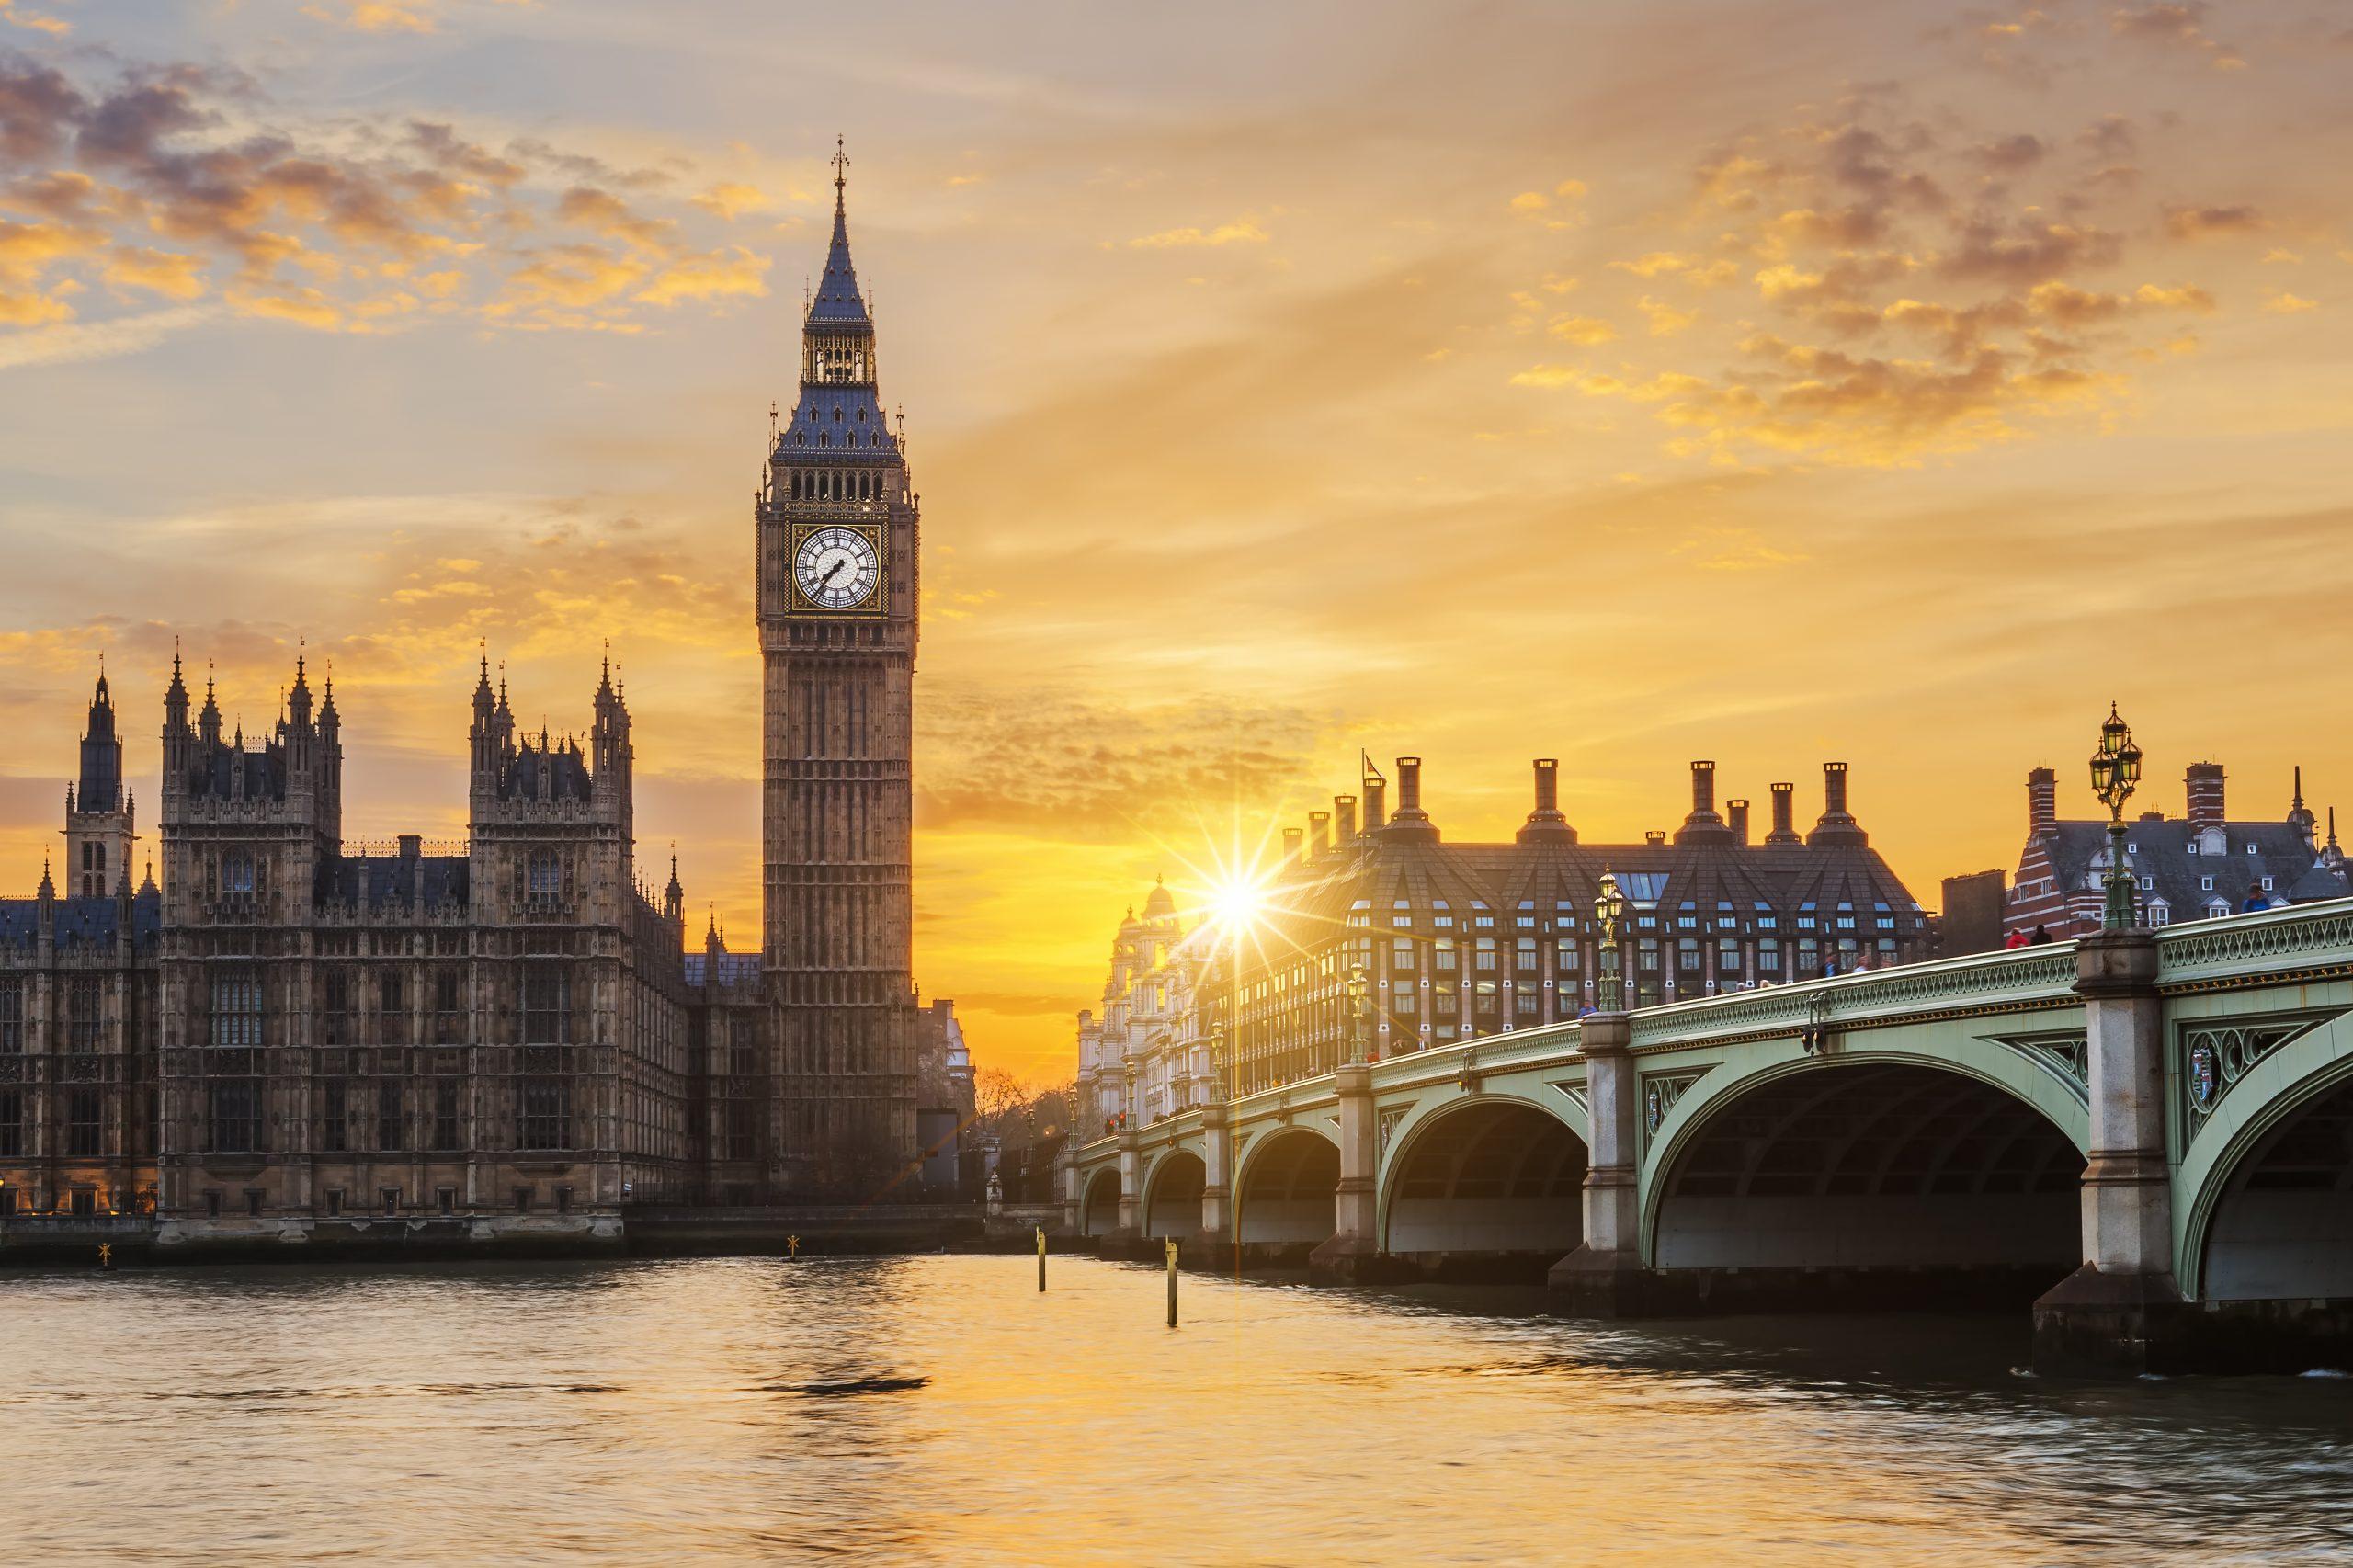 Big Ben and Westminster Bridge at sunset